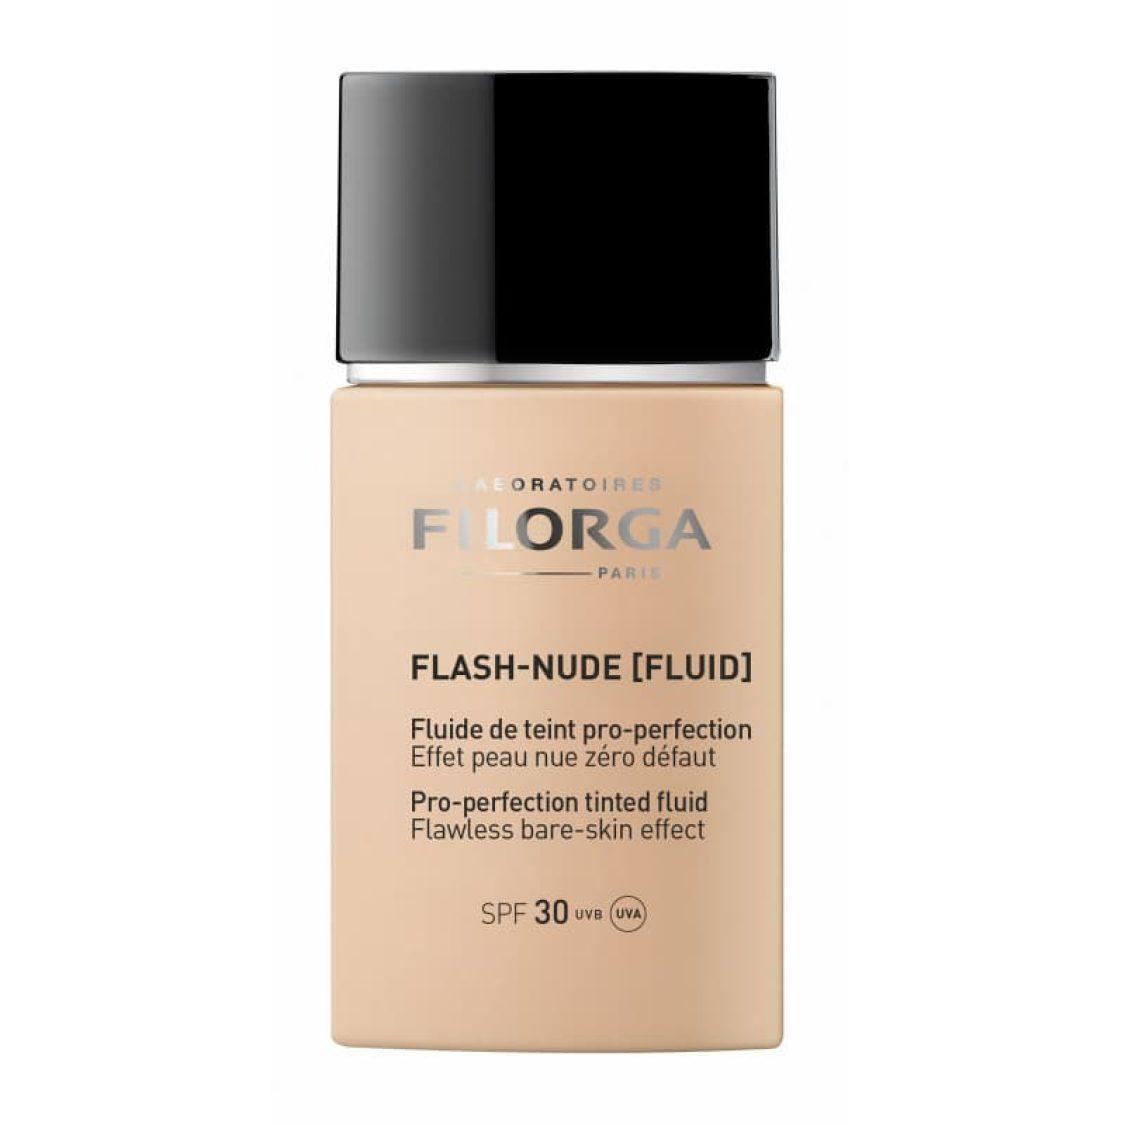 Filorga - Flash-Nude (Fluid) 02 - Medium-Dark 30ml